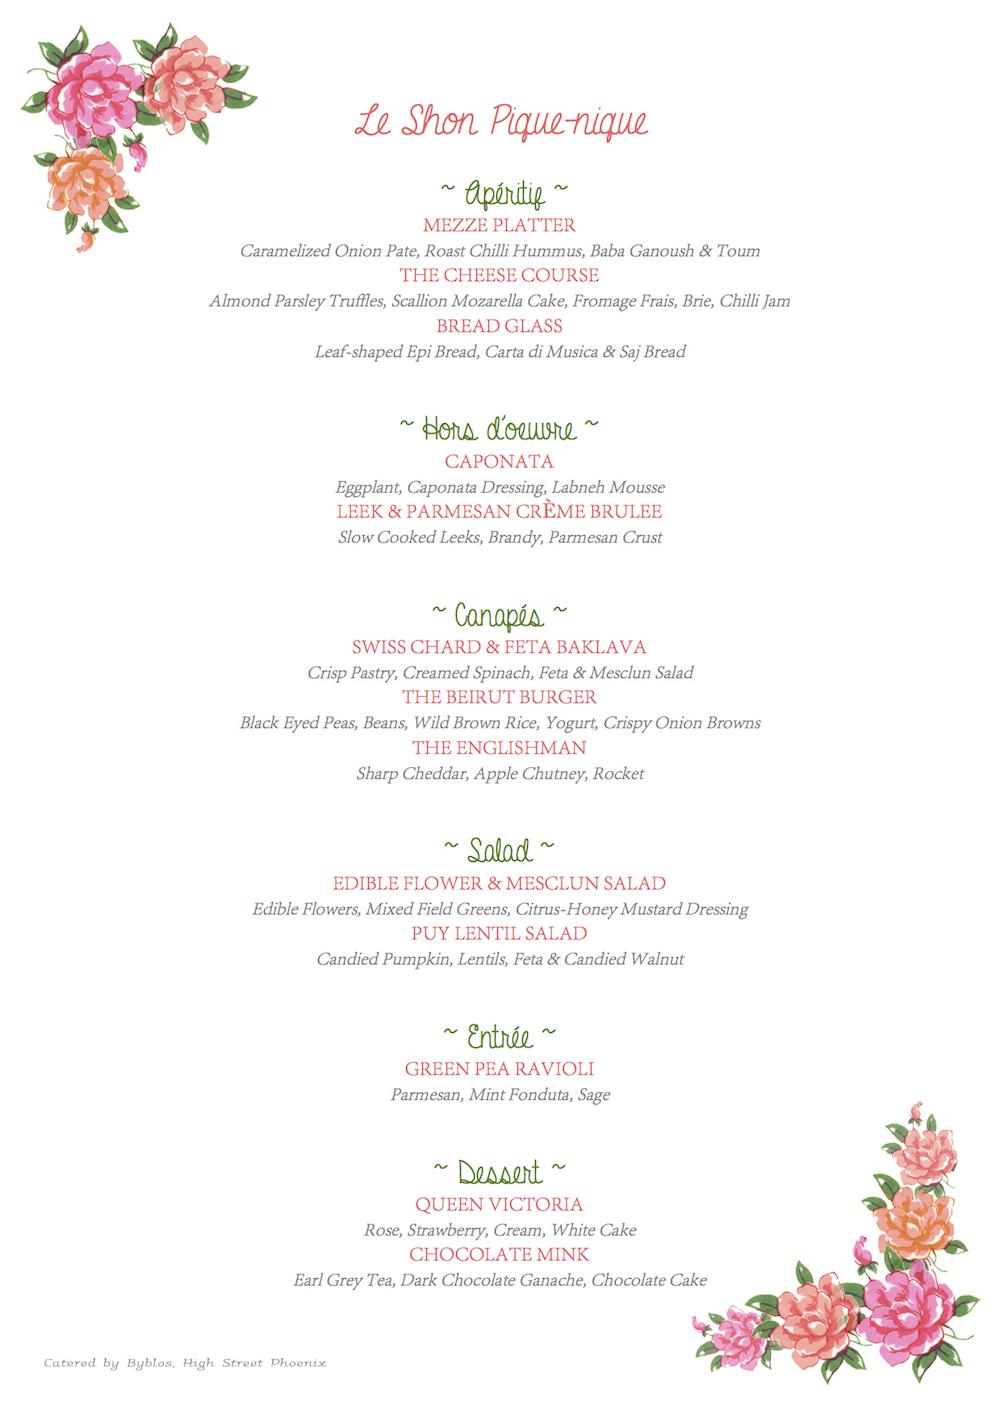 Of Tea Cakes, Farm Roses & 7 Course Meals | Shonan's ...